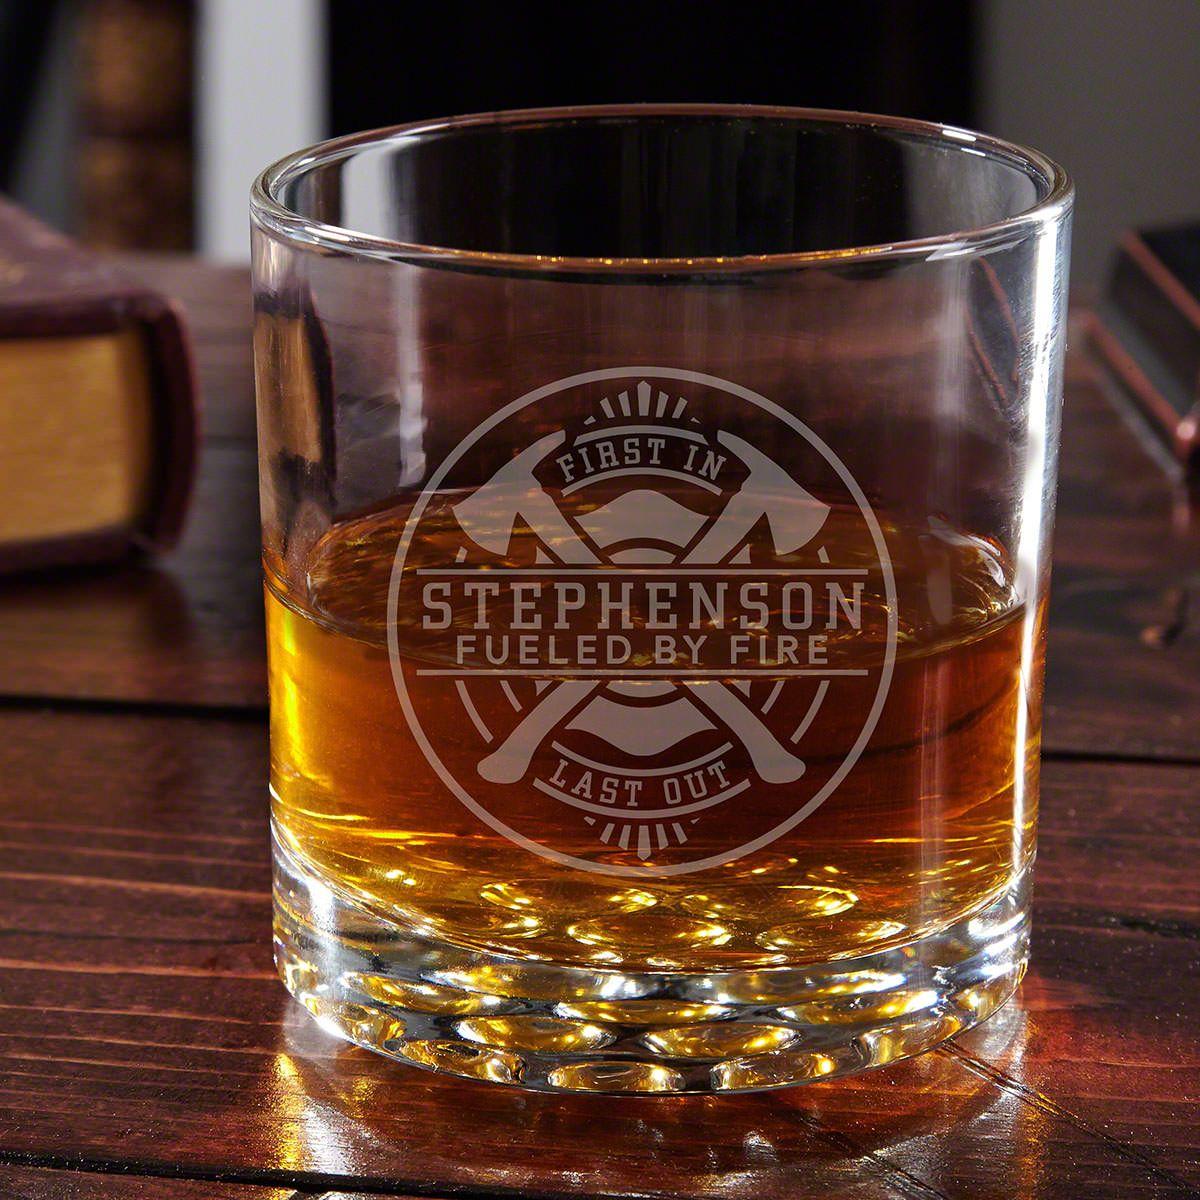 Firefighter Brotherhood Buckman Glass Personalized Firefighter Gift